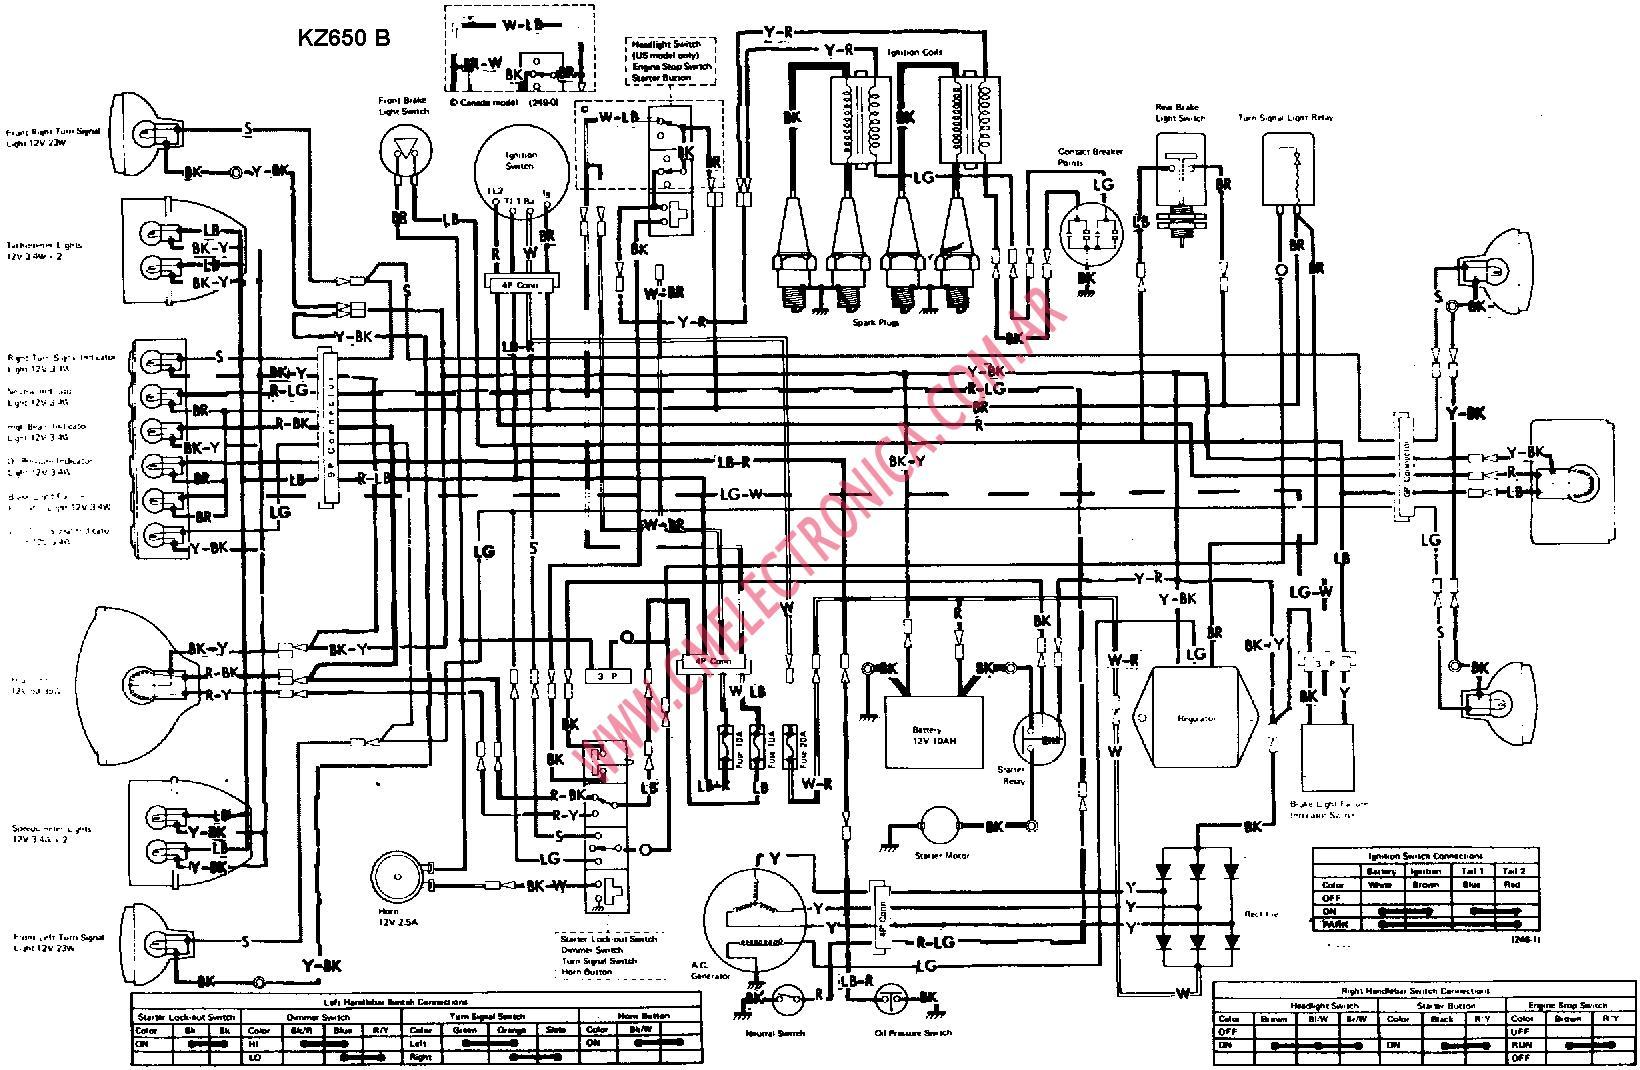 1979 kz650 wiring diagram